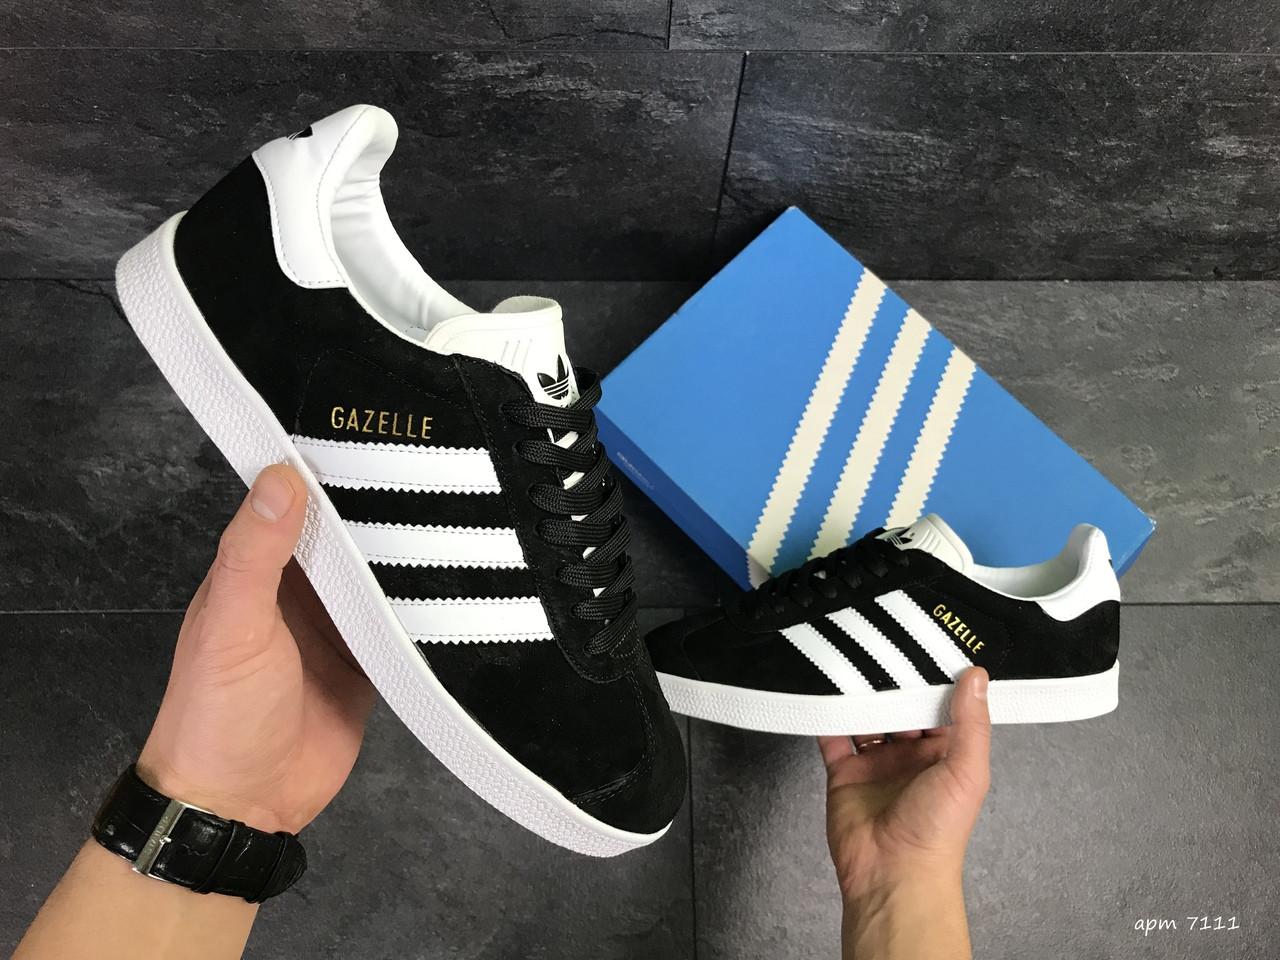 Мужские кроссовки Adidas Gazelle / кеды адидас газели / чоловічі кеди адідас (Топ реплика ААА+)